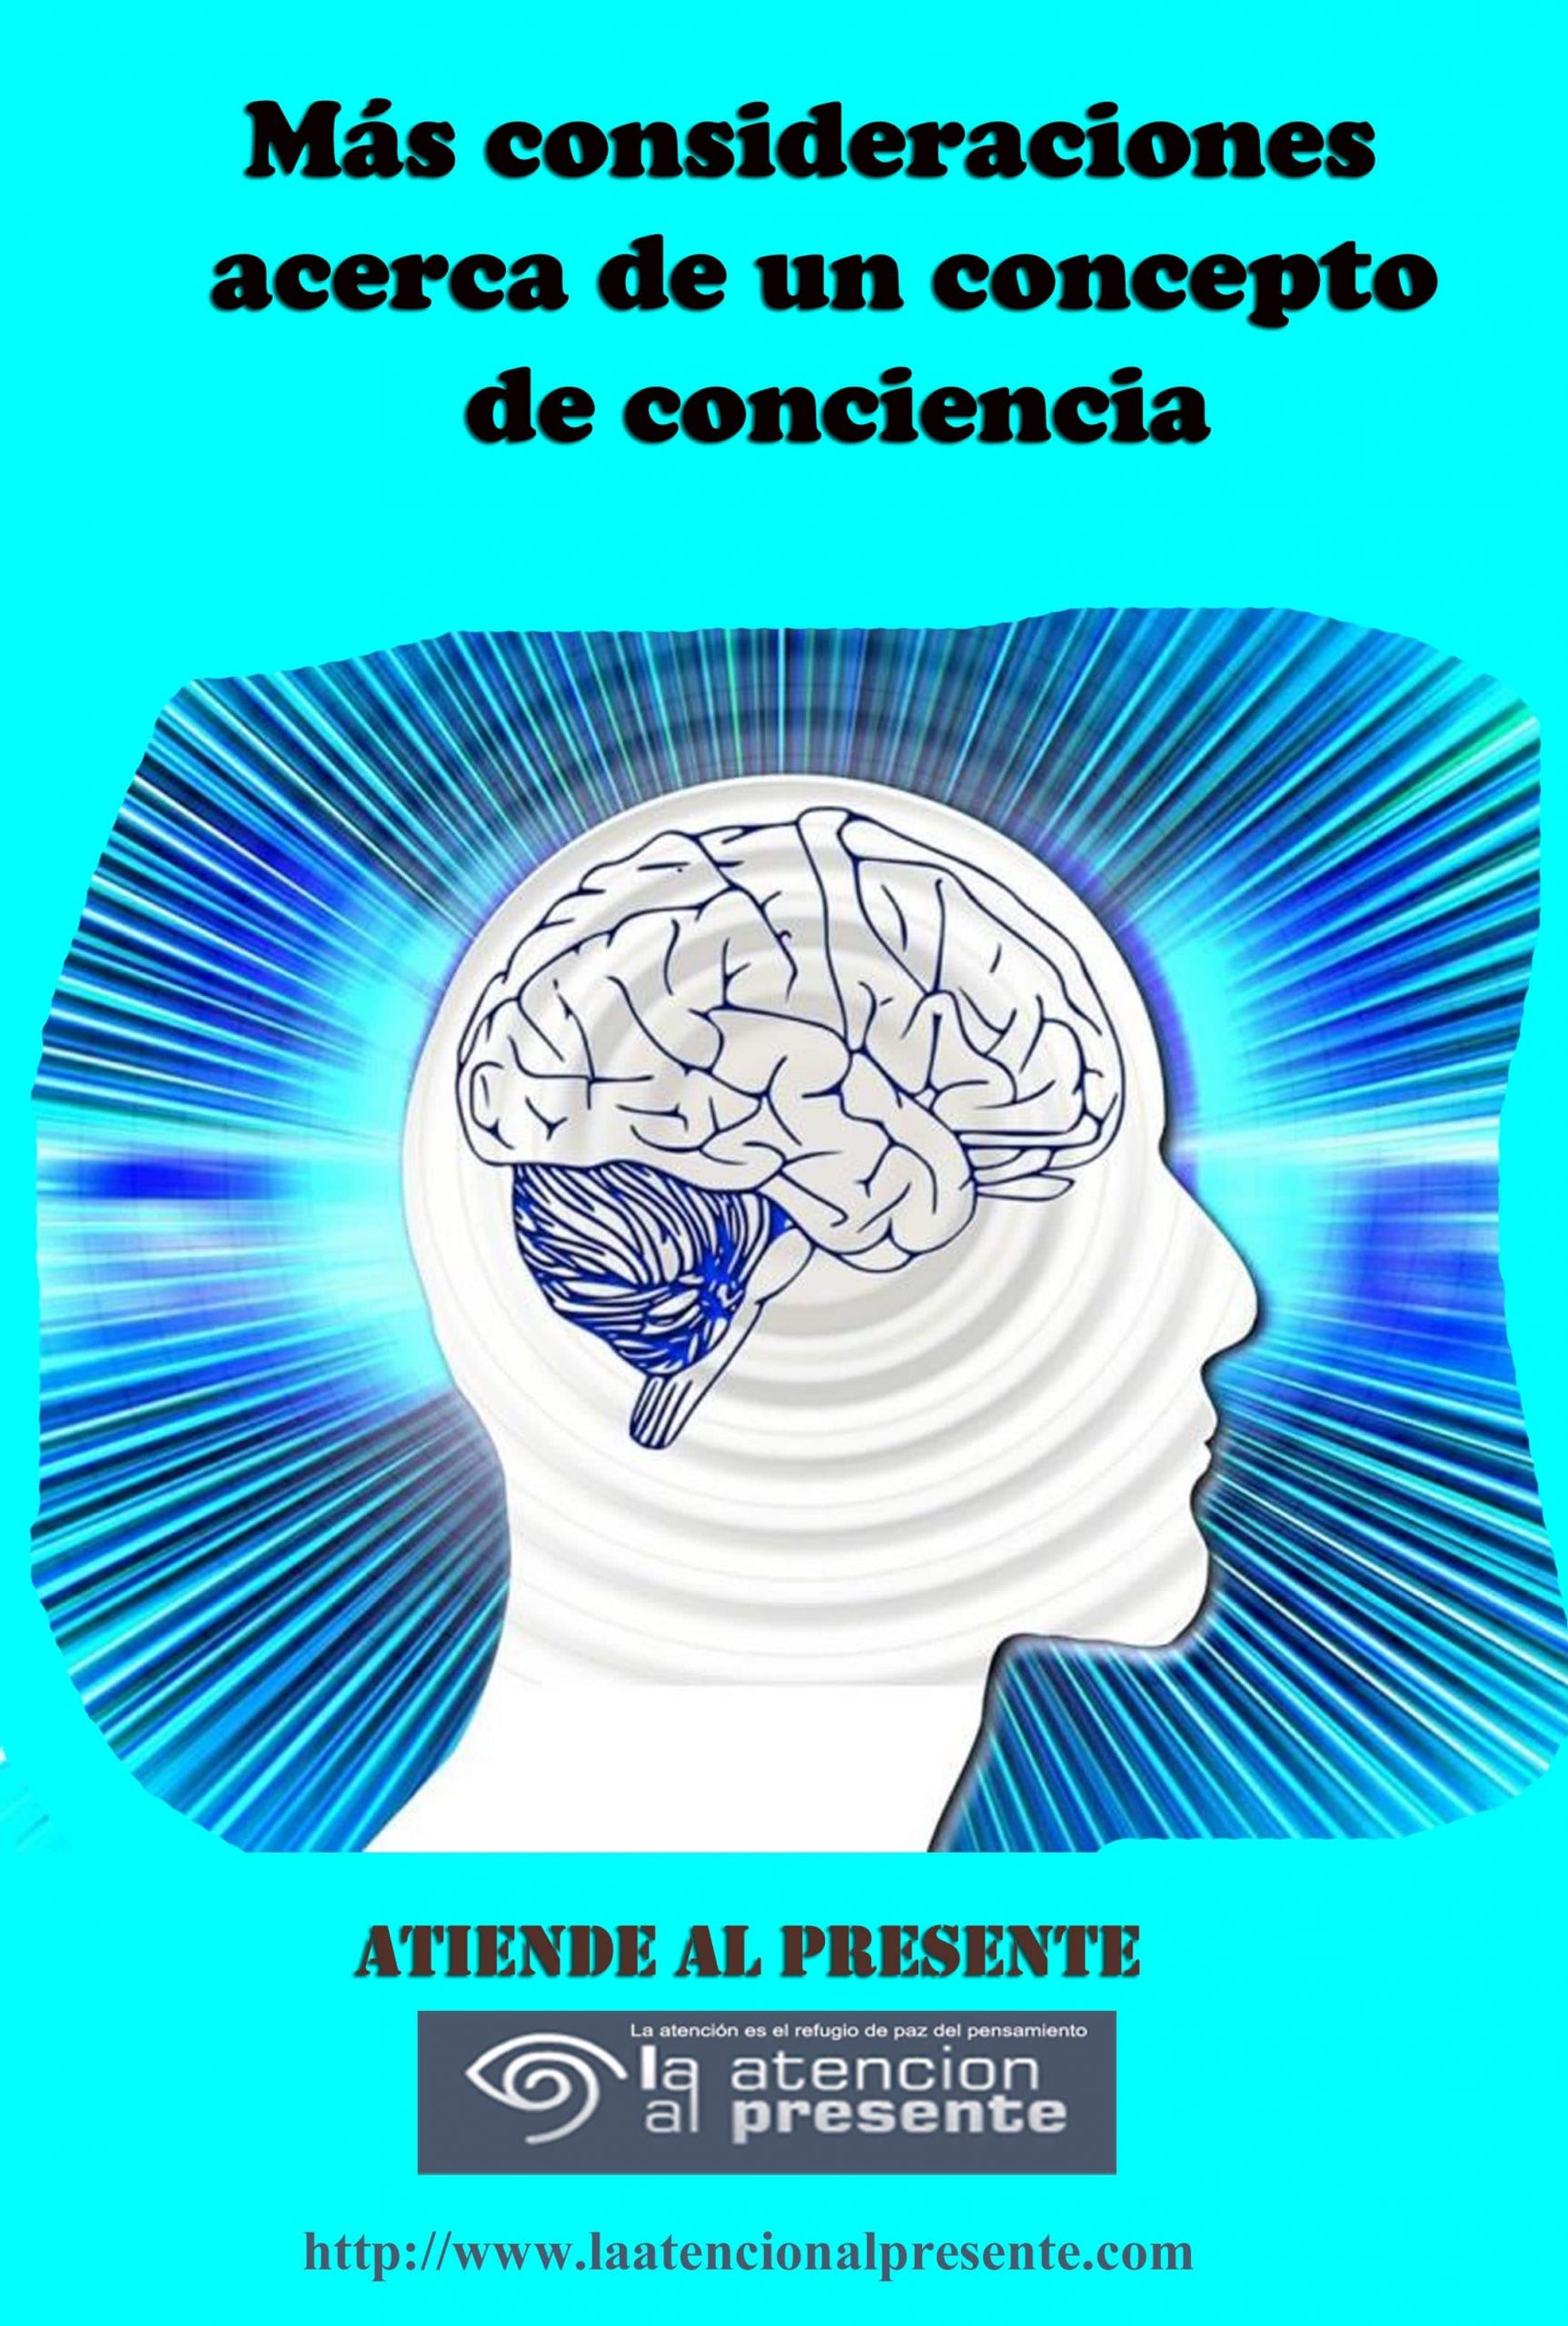 27 de Diciembre Esteban Mas consideraciones acerca de un concepto de conciencia min scaled